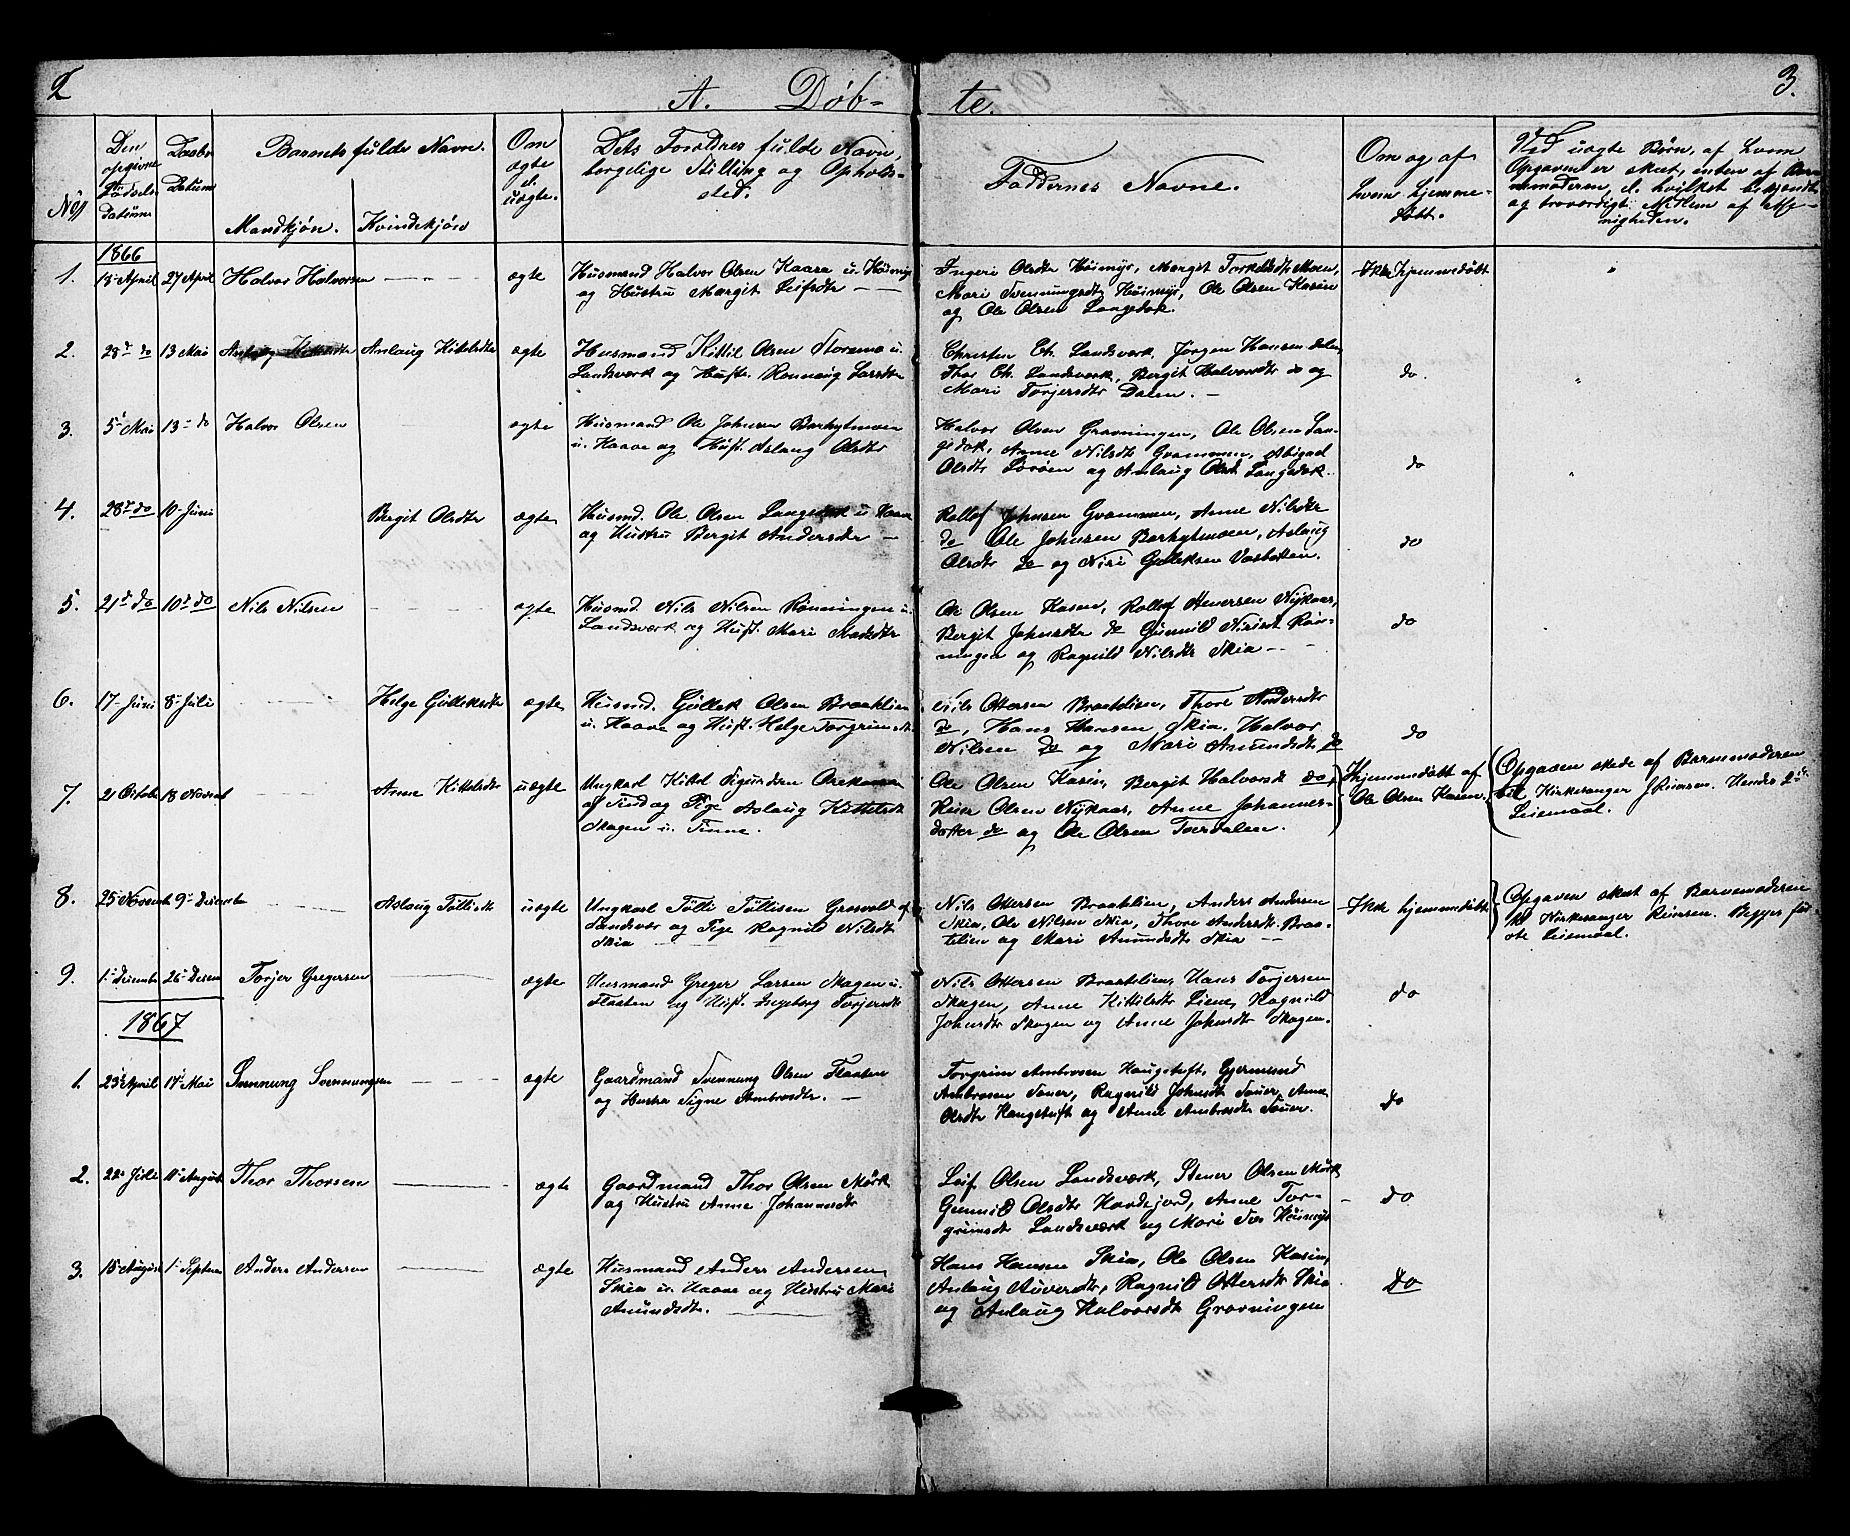 SAKO, Heddal kirkebøker, G/Gb/L0001: Klokkerbok nr. II 1, 1866-1887, s. 2-3